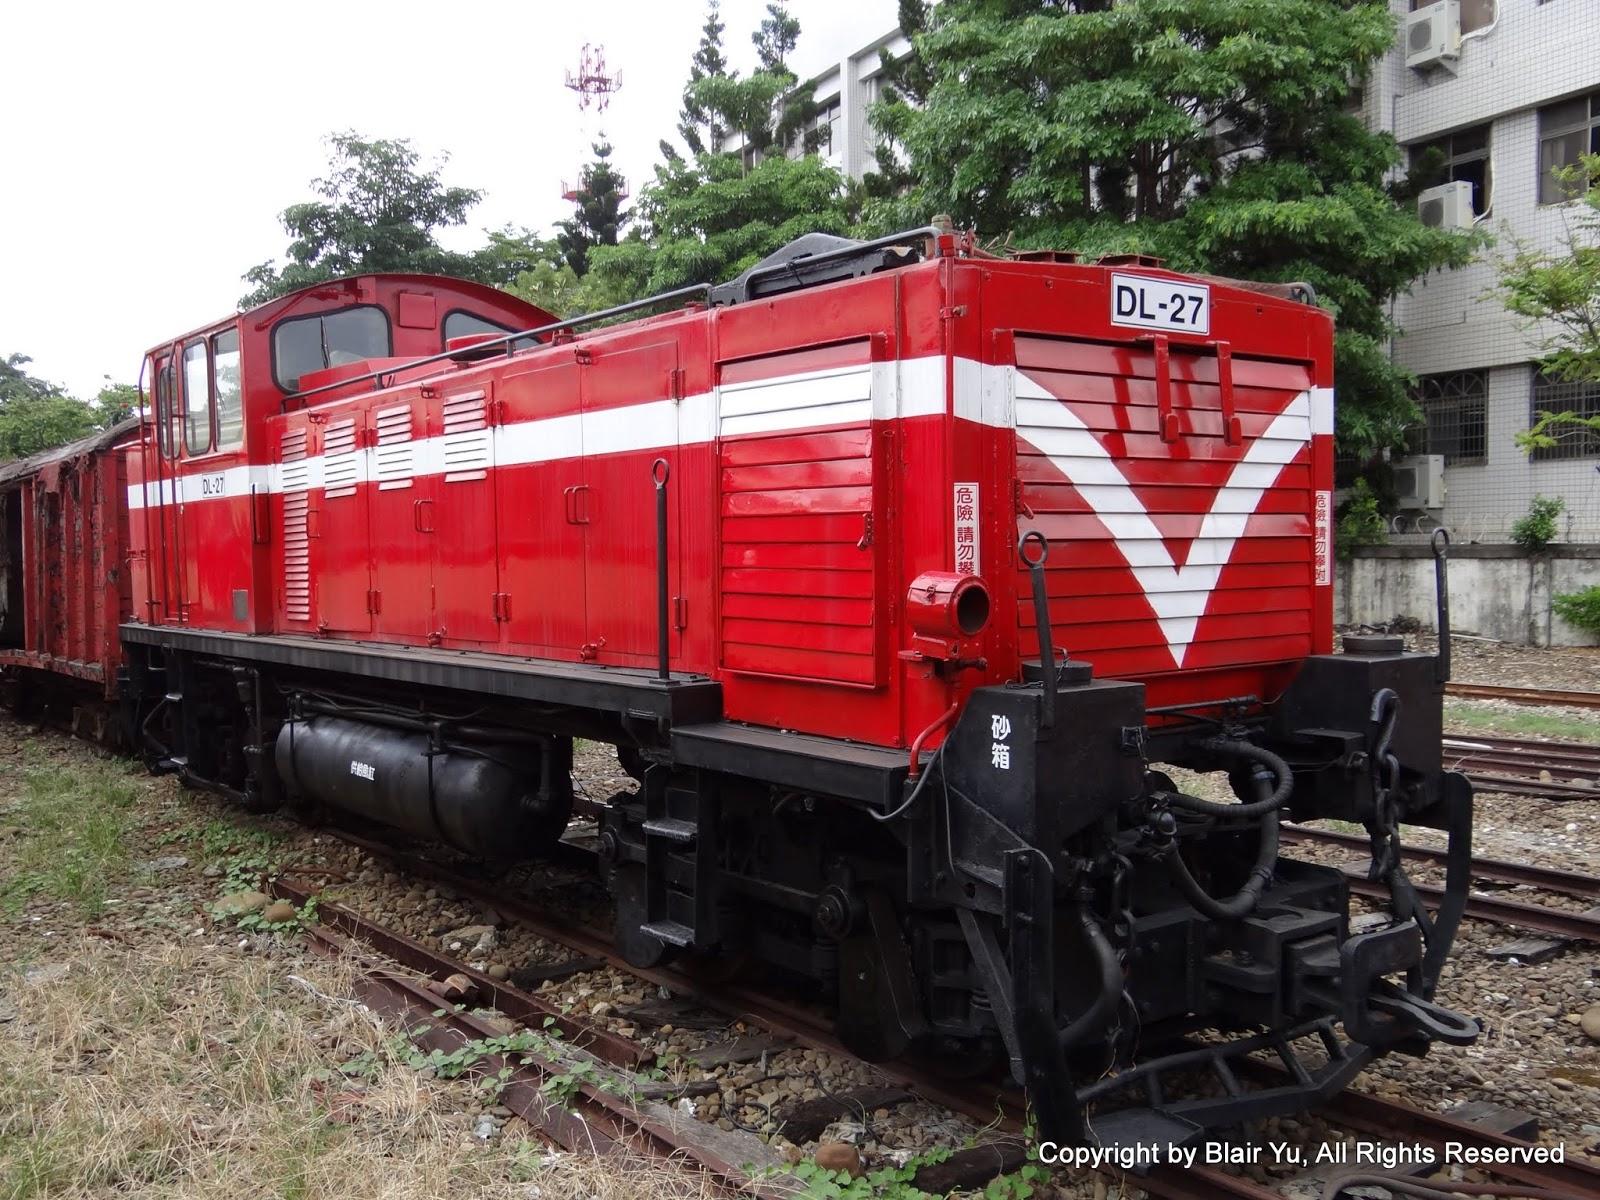 Blair's 鐵道攝影: DL27柴油機車 / Alishan Forest Railway DL27 Diesel Locomotive